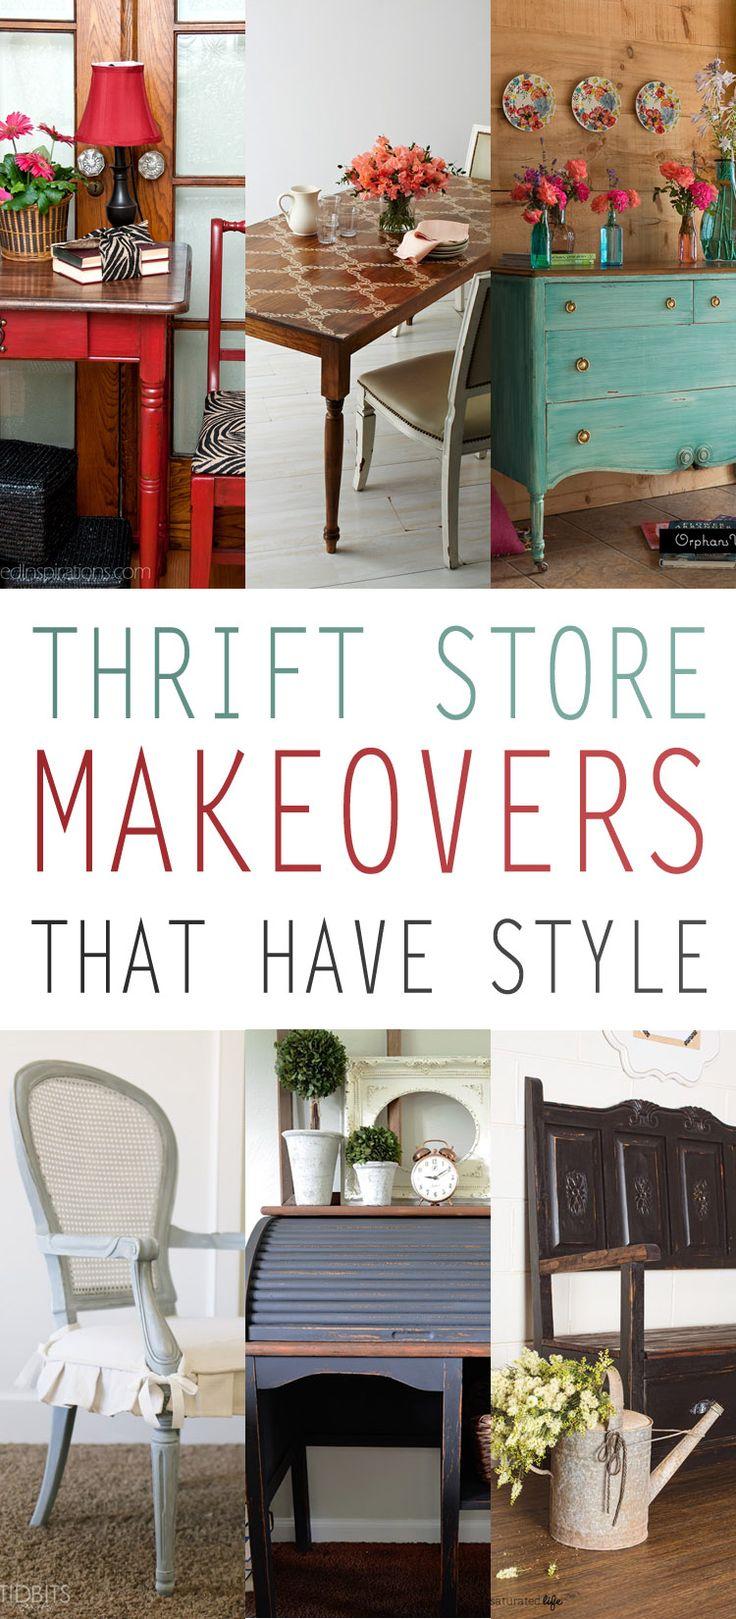 257 Best Images About Thrift Store Furniture Flips On Pinterest Vintage Dressers Furniture